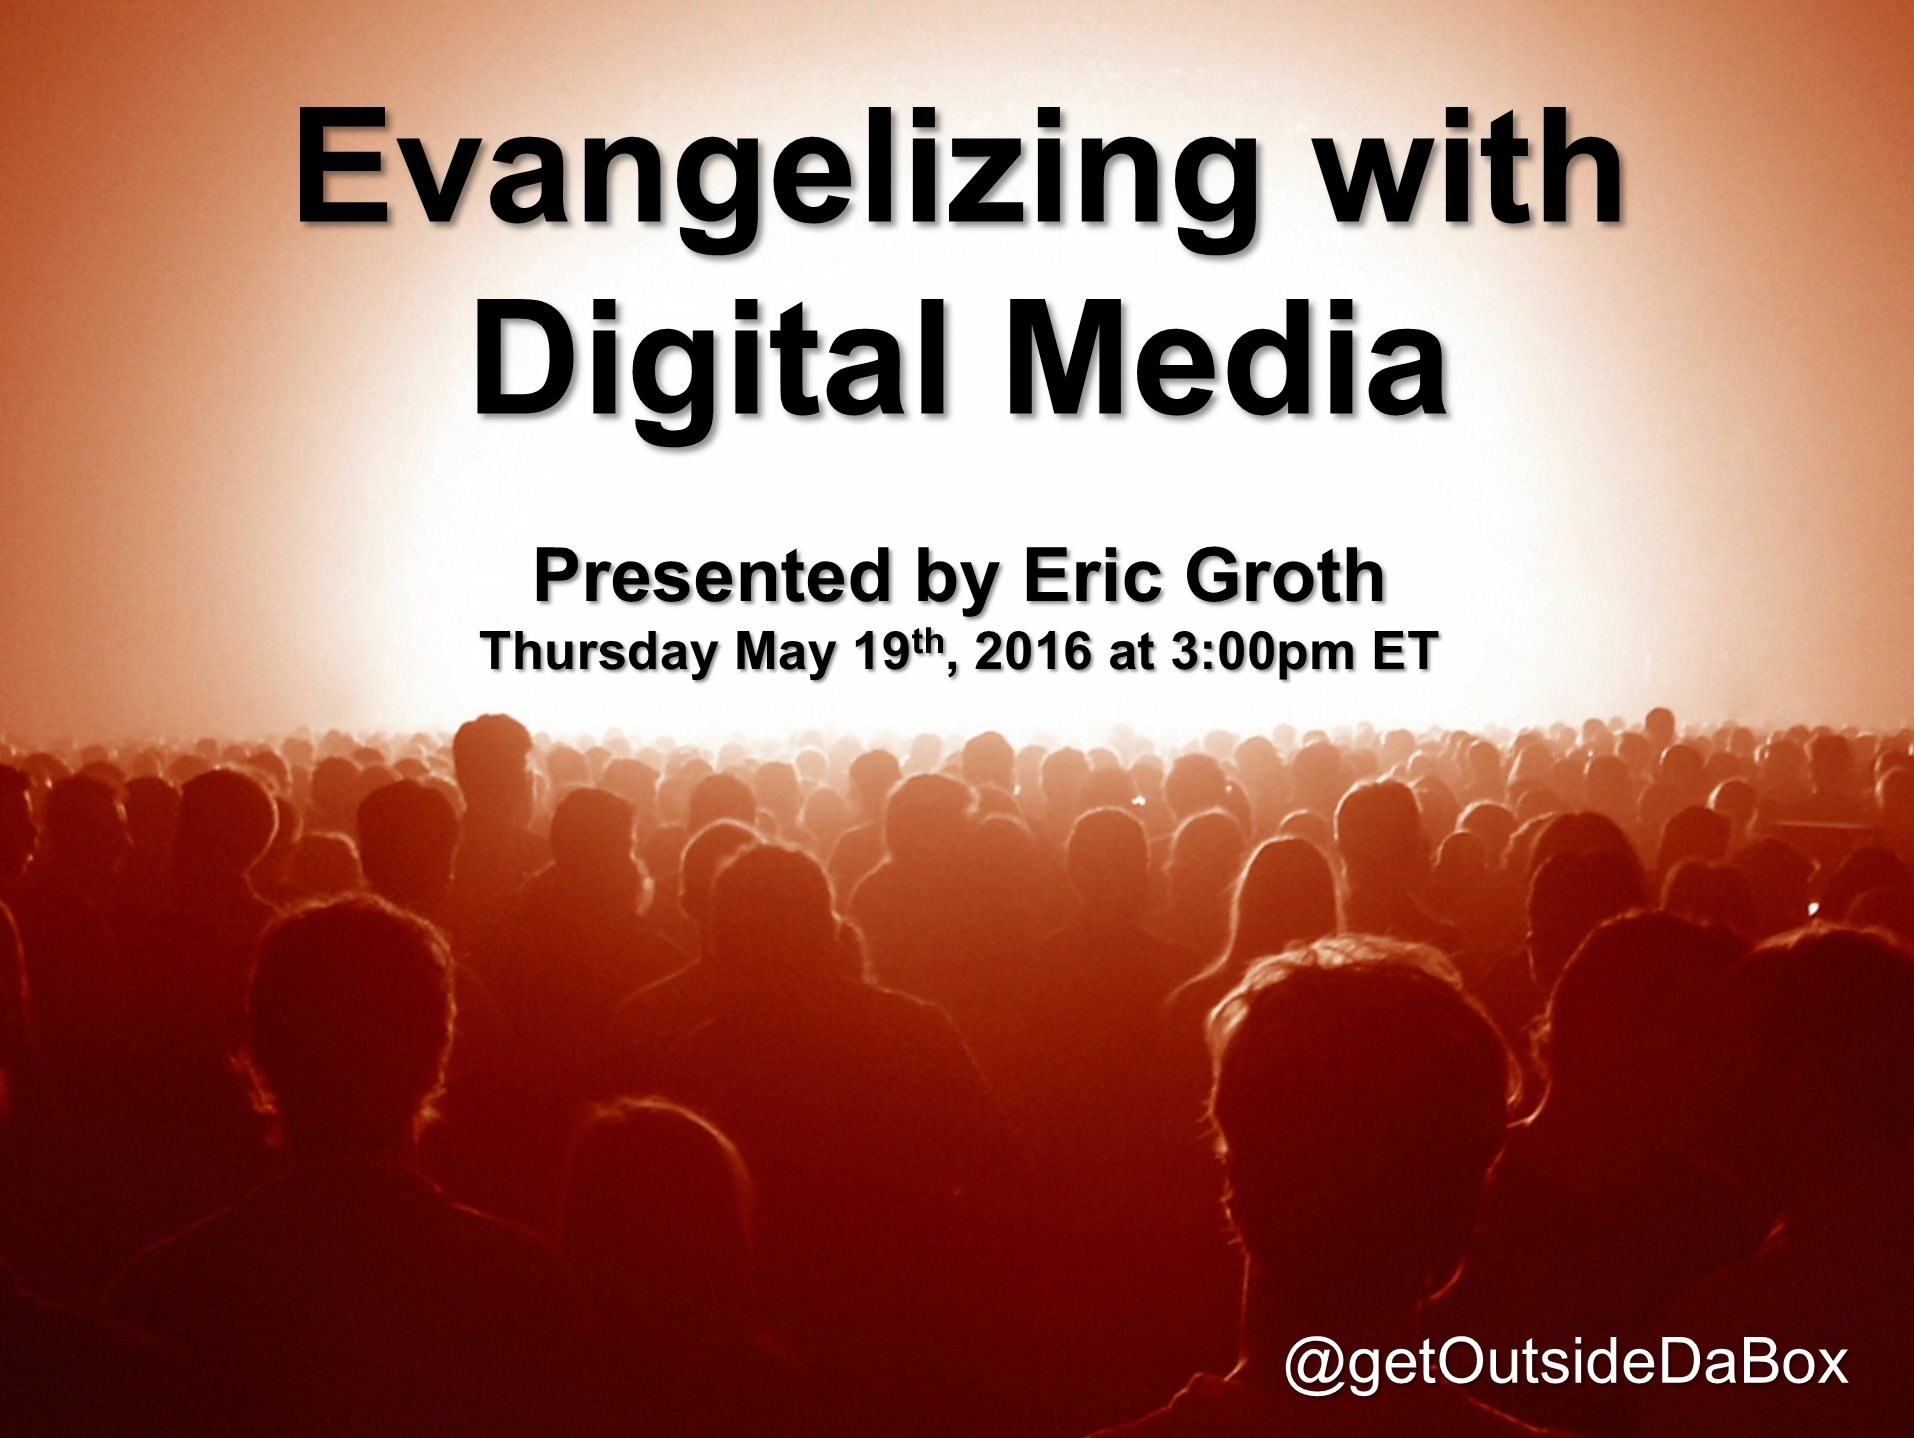 5 19 16 Evangelizing with Digital Media Header